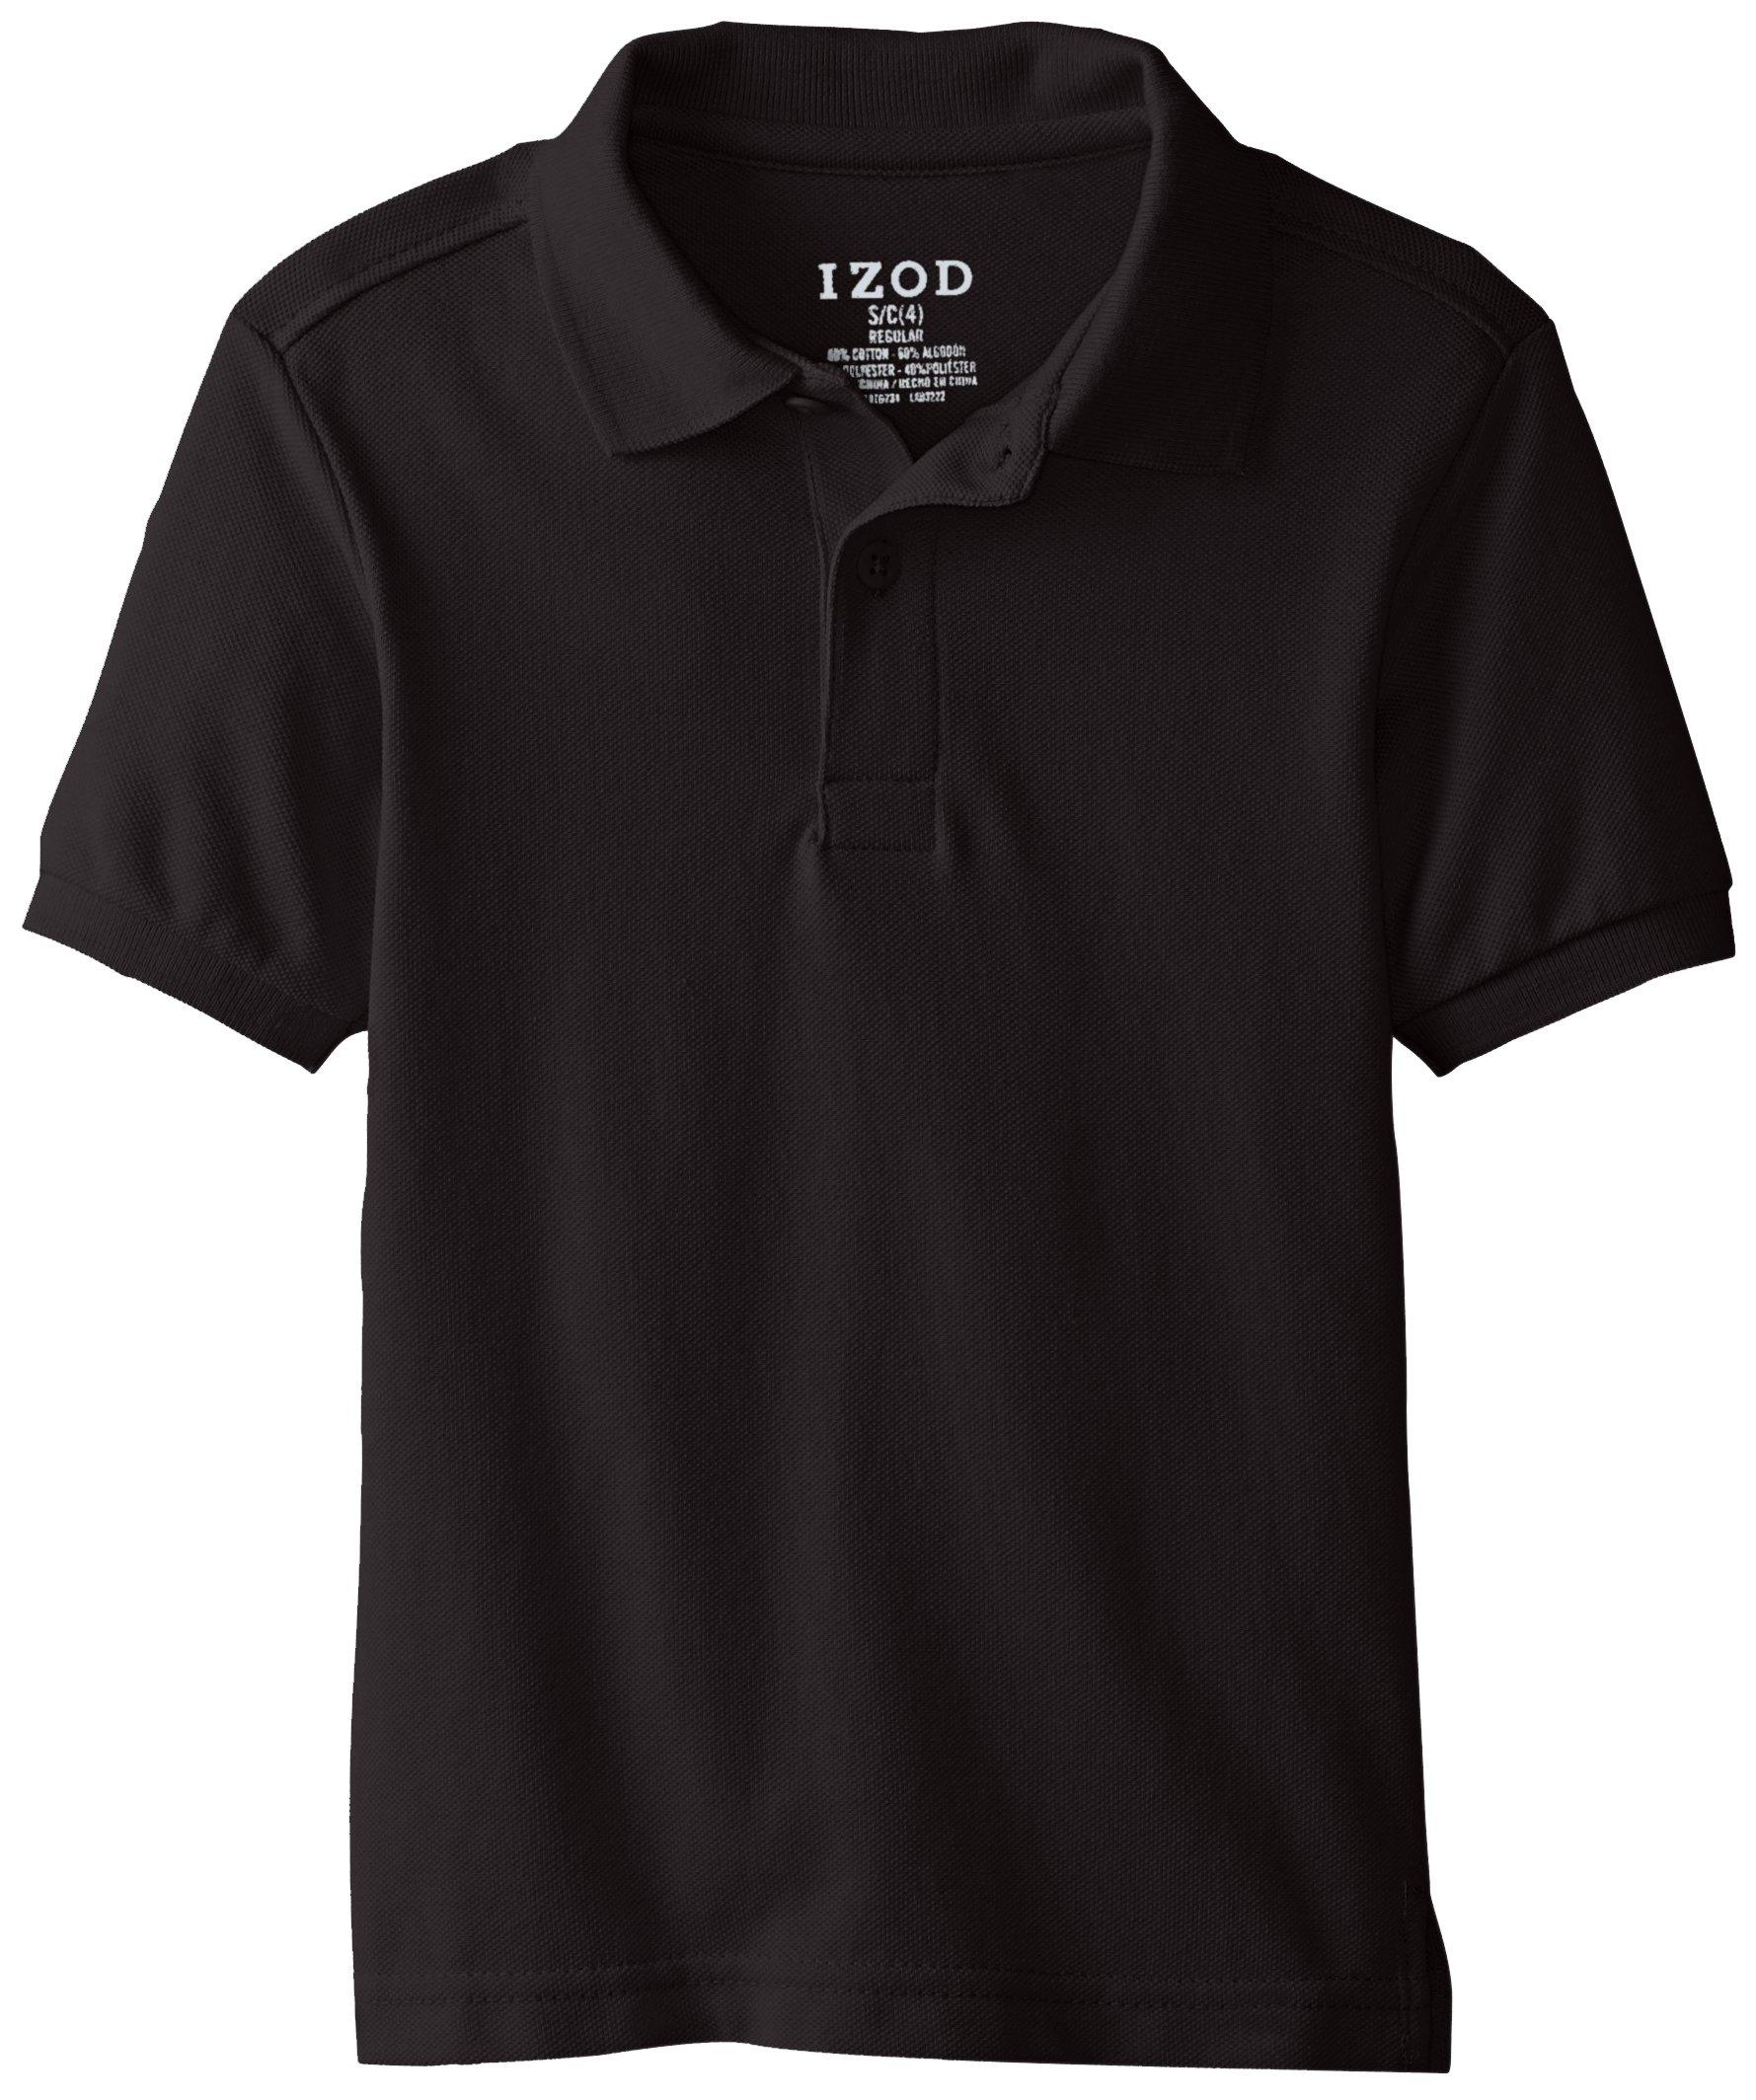 IZOD Little Boys' Short Sleeve Uniform Polo, Black, Small